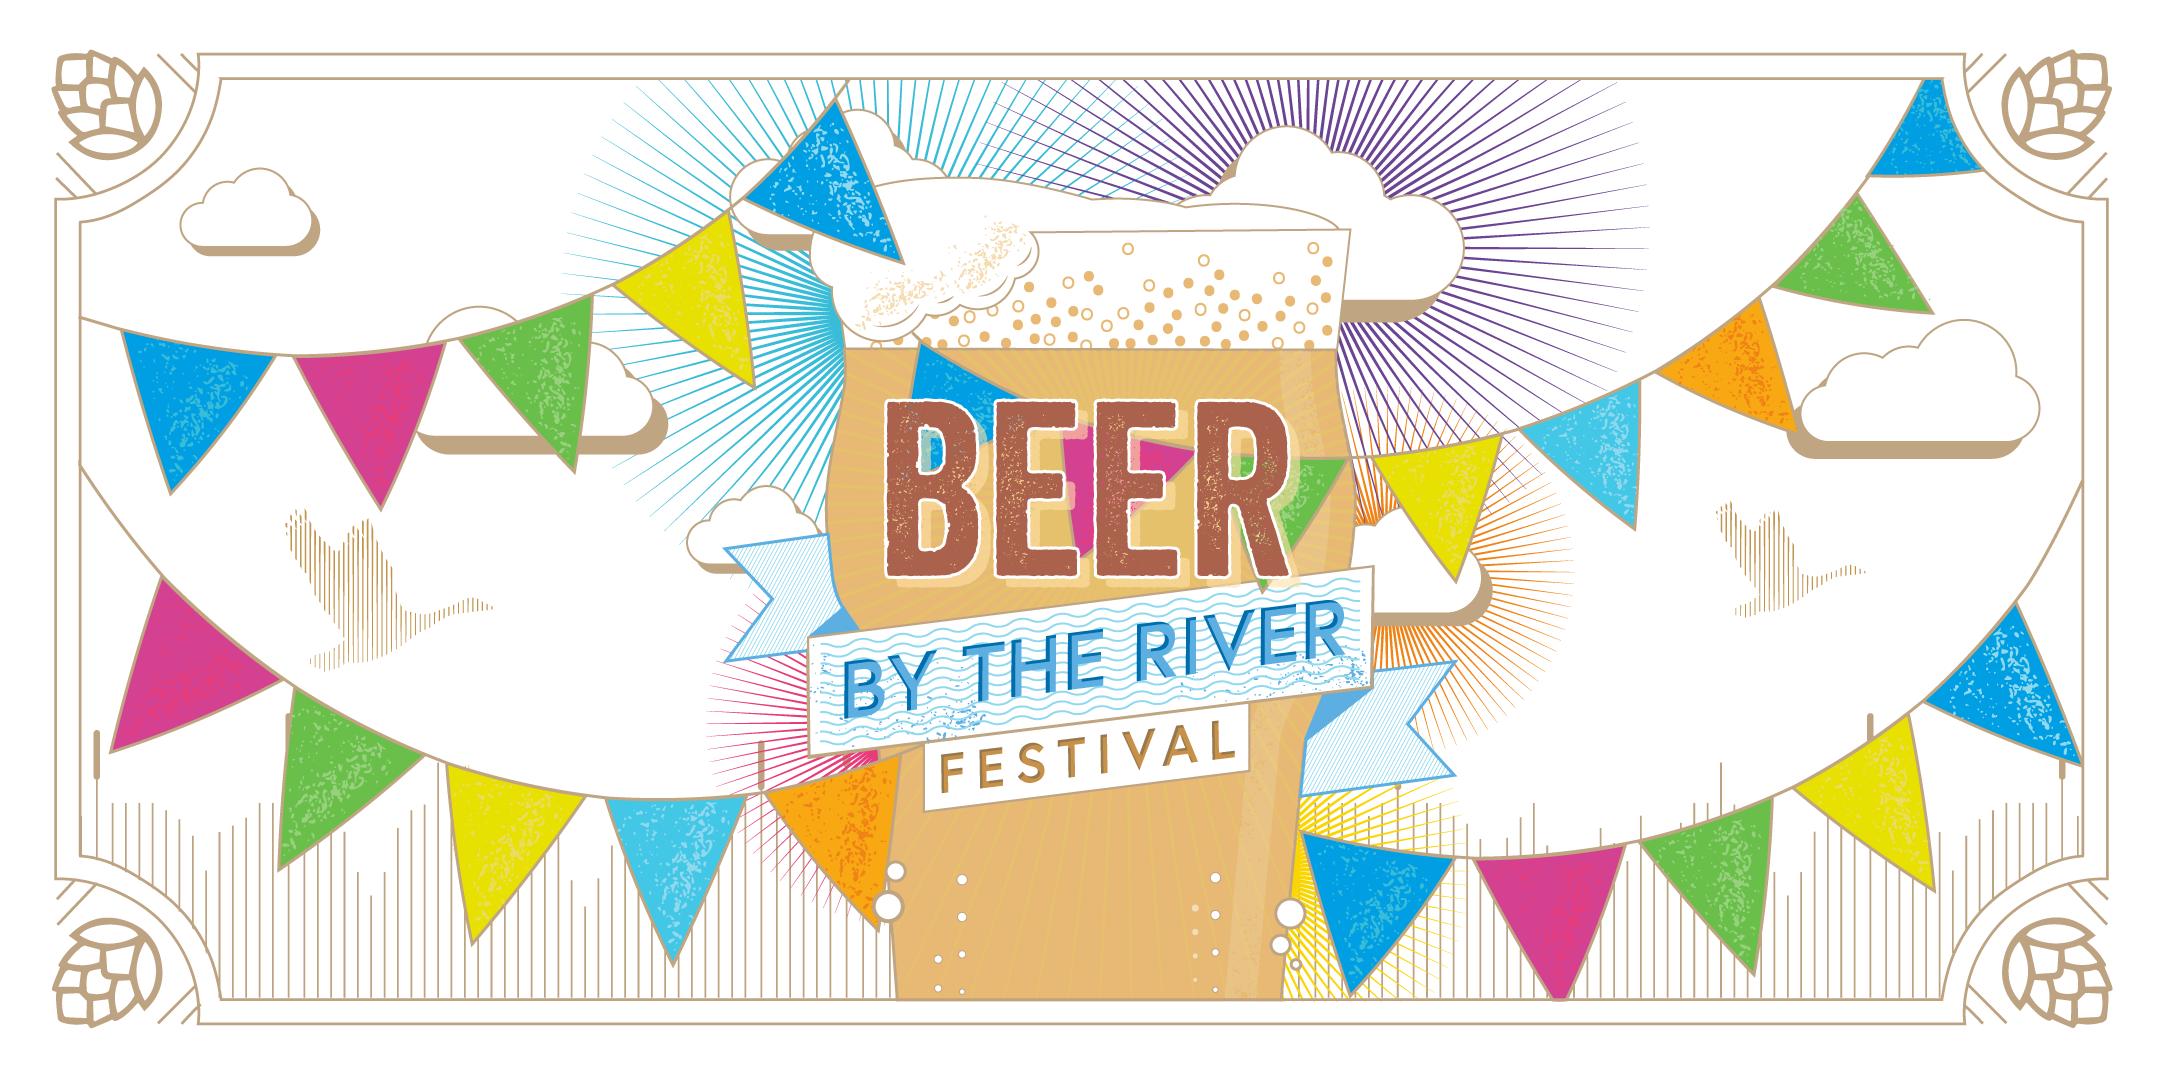 Craft Beer Festival in London